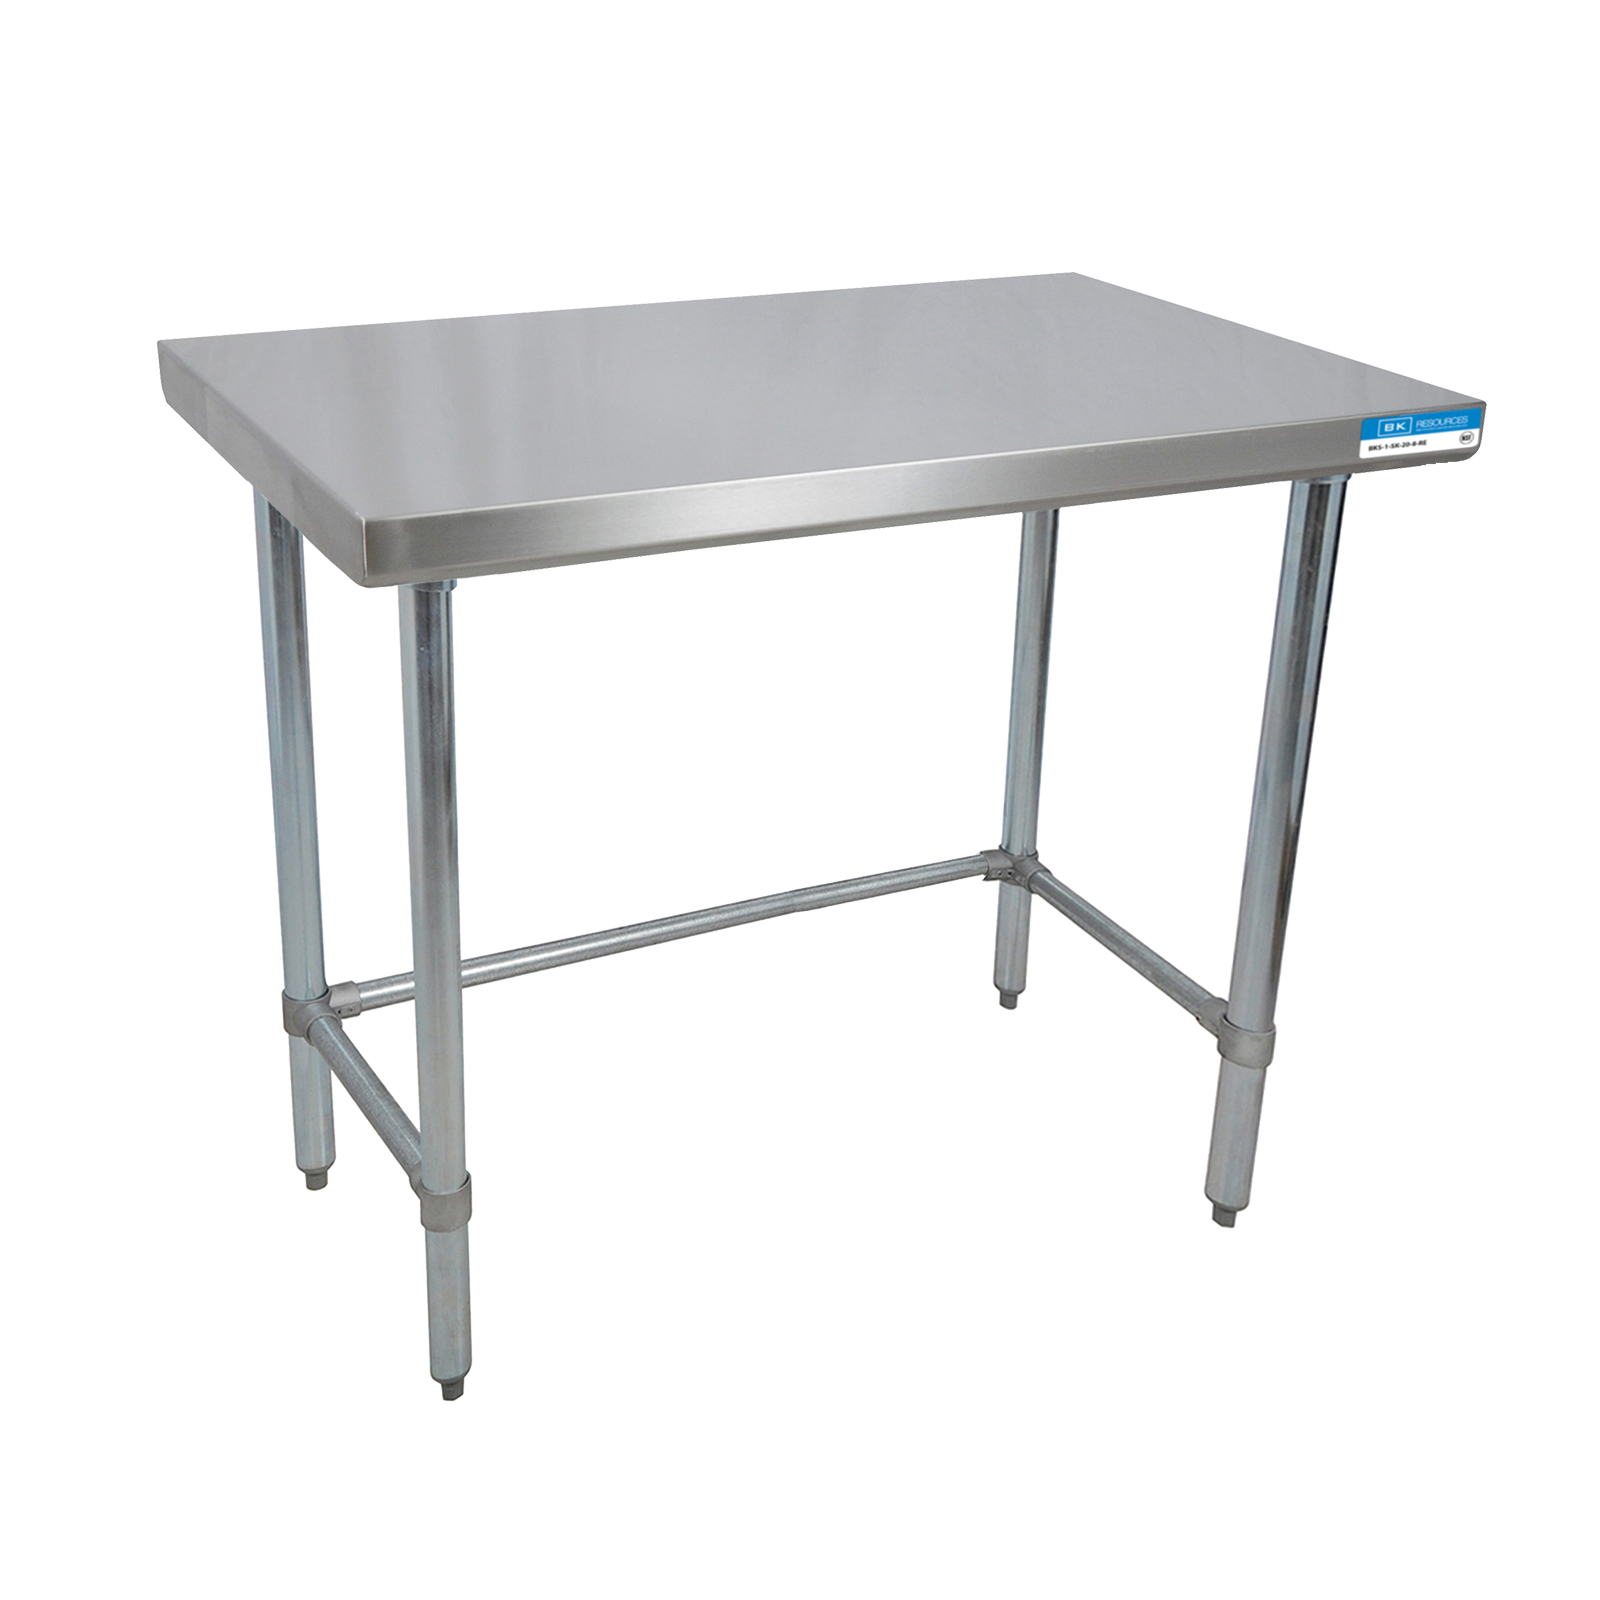 BK Resources SVTOB-3630 work table,  36